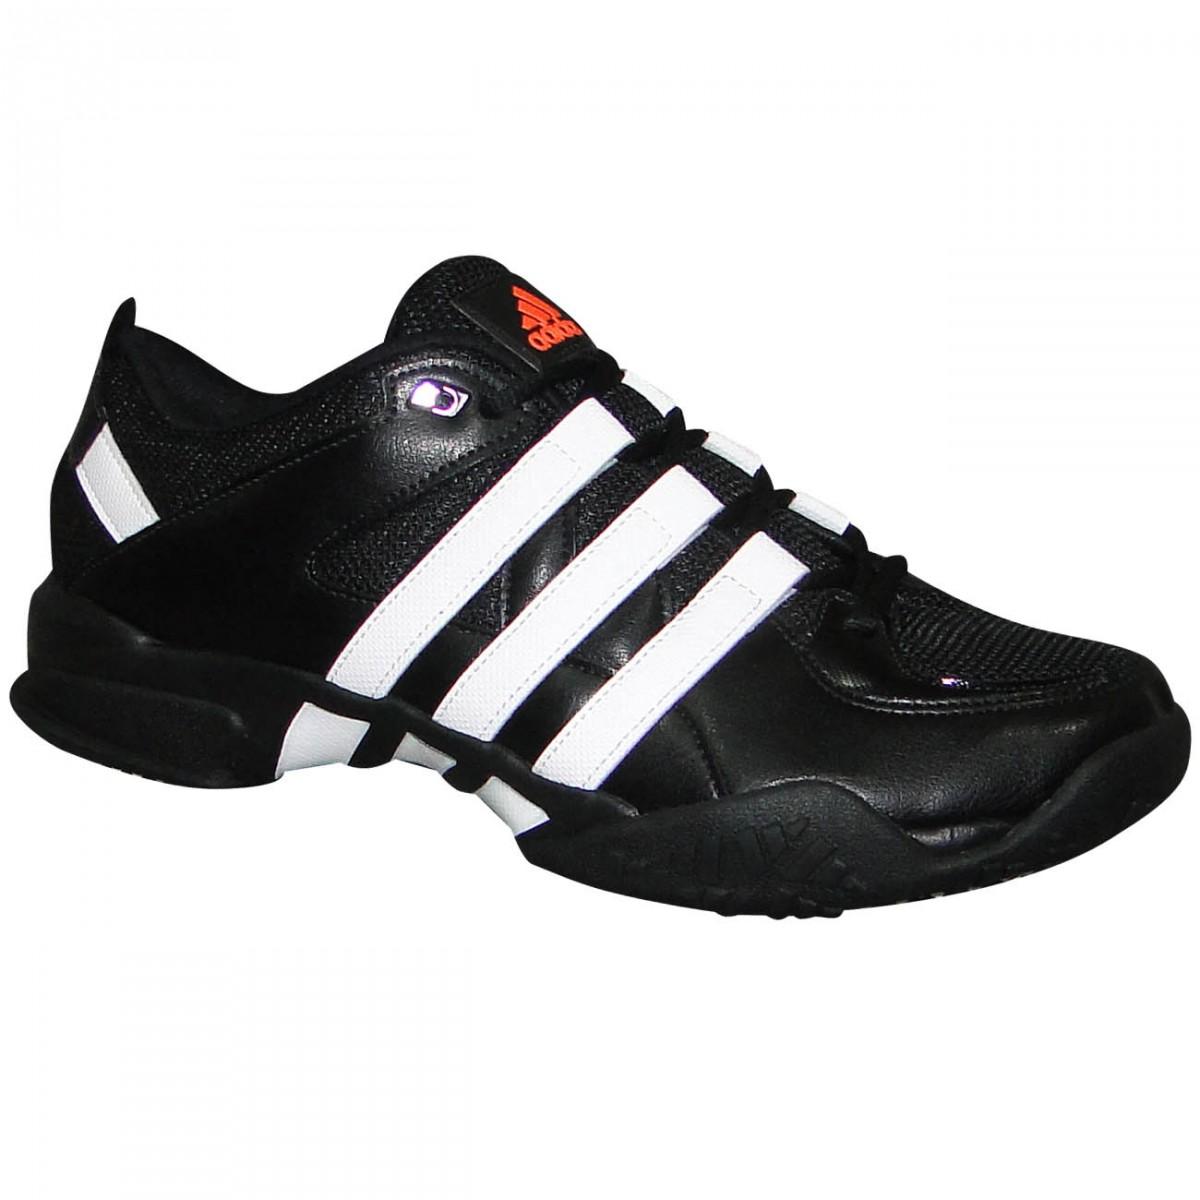 e0ccd469355 Tenis Adidas 4.4 D96210 - Preto Branco - Chuteira Nike